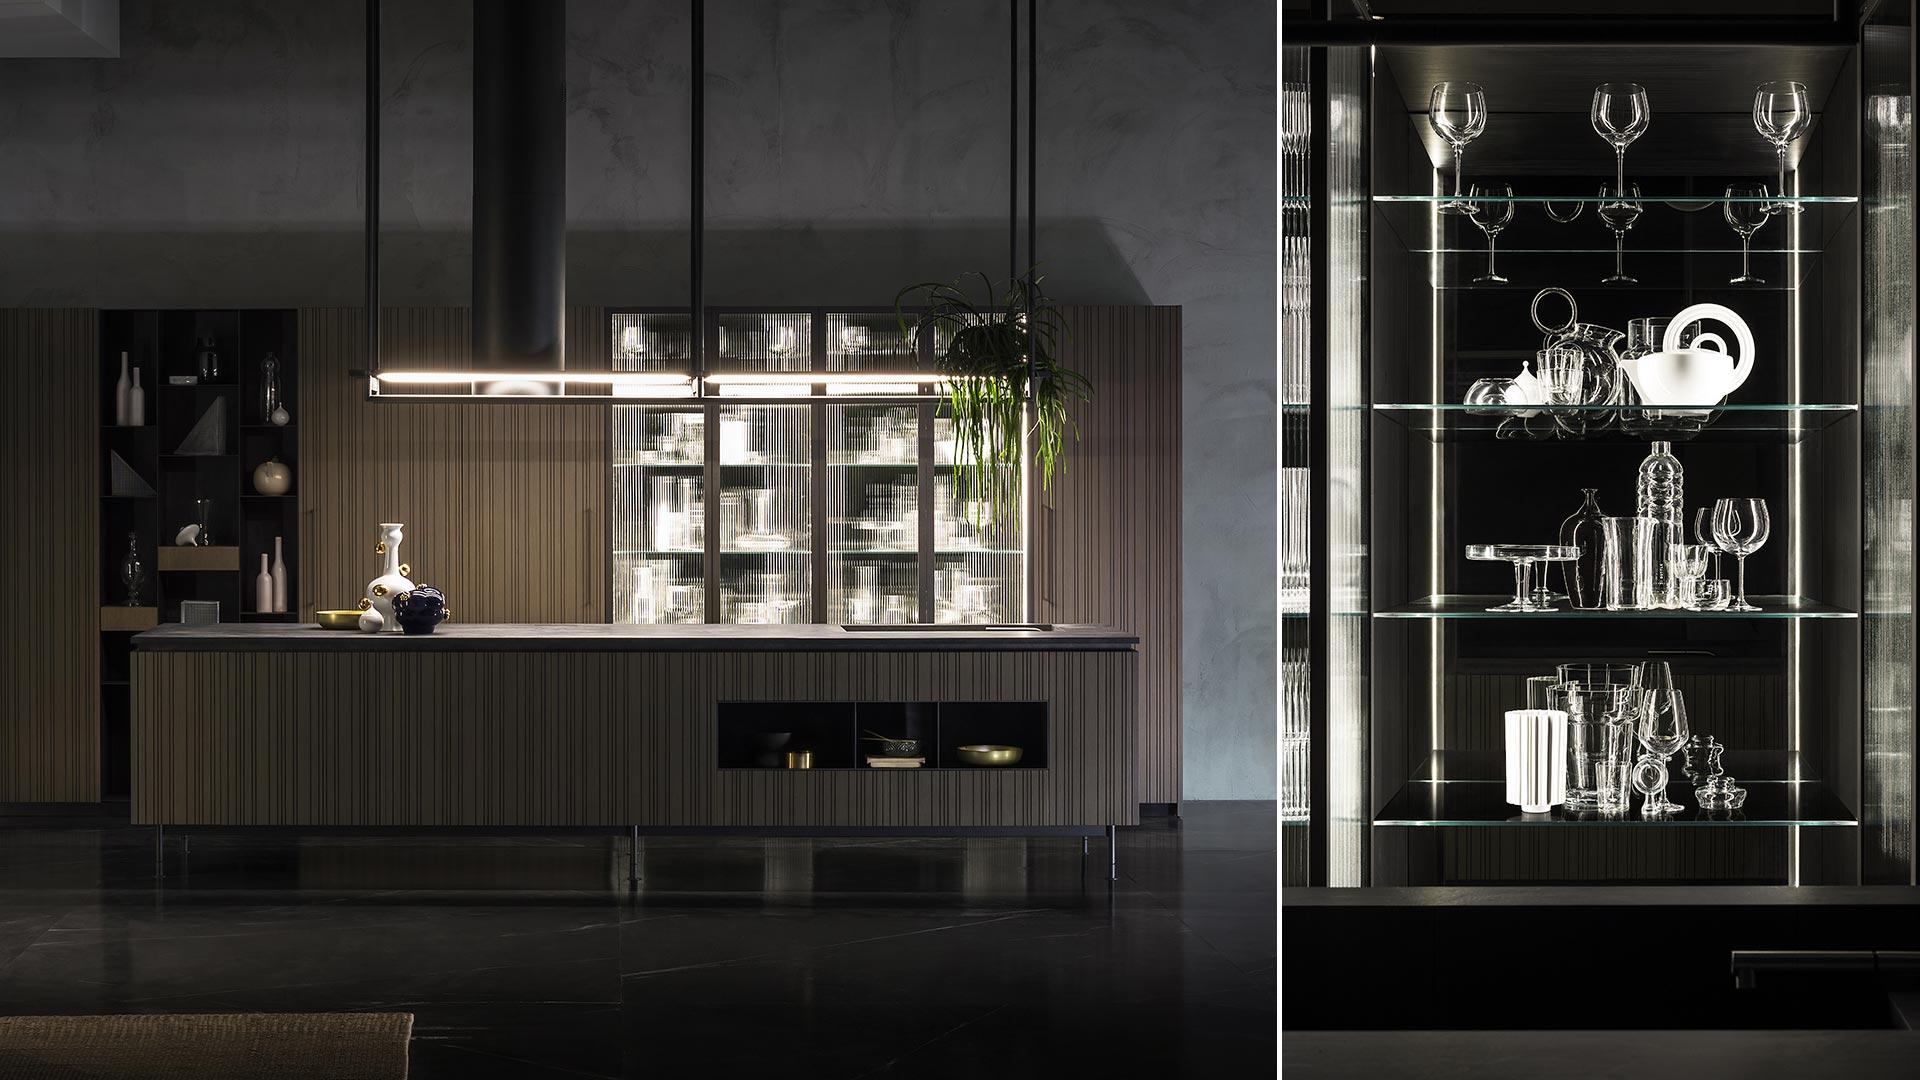 Design kitchen, wood kitchen - Collection RUA - TM_MI2018_Rua_006B